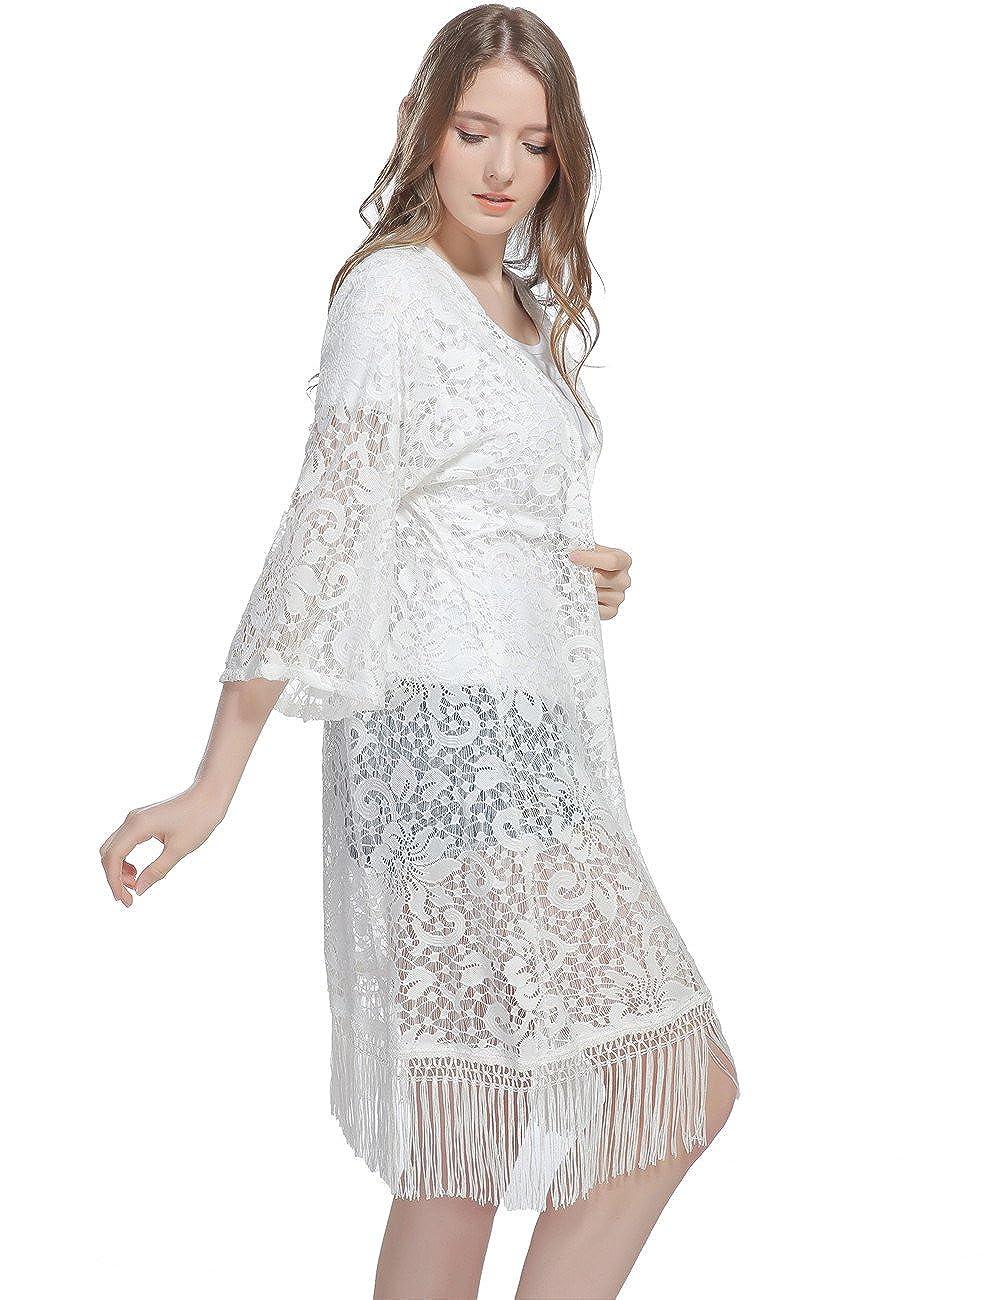 ba34f47dd2a Genovega Lace Women s Beach Kimono Cover up - Summer Sleeve White Soft  Crochet Ruana Bikini Cover Swimwear Swimsuit Coverup Dress Summer Beach  Outfit for ...